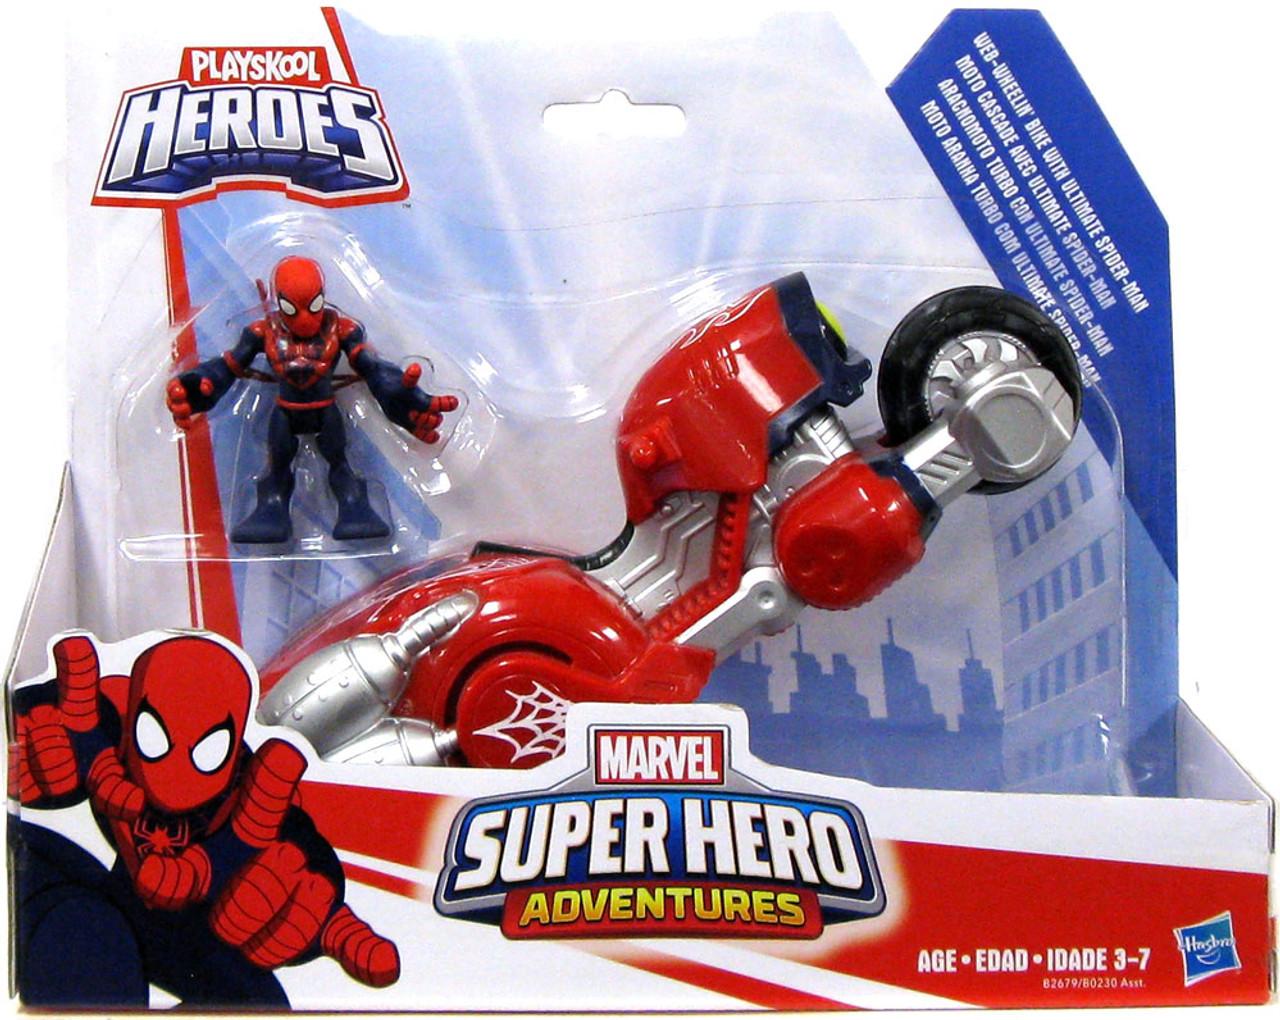 Playskool Marvel Super Hero Adventure Clear Transparent Red Pink Spiderman